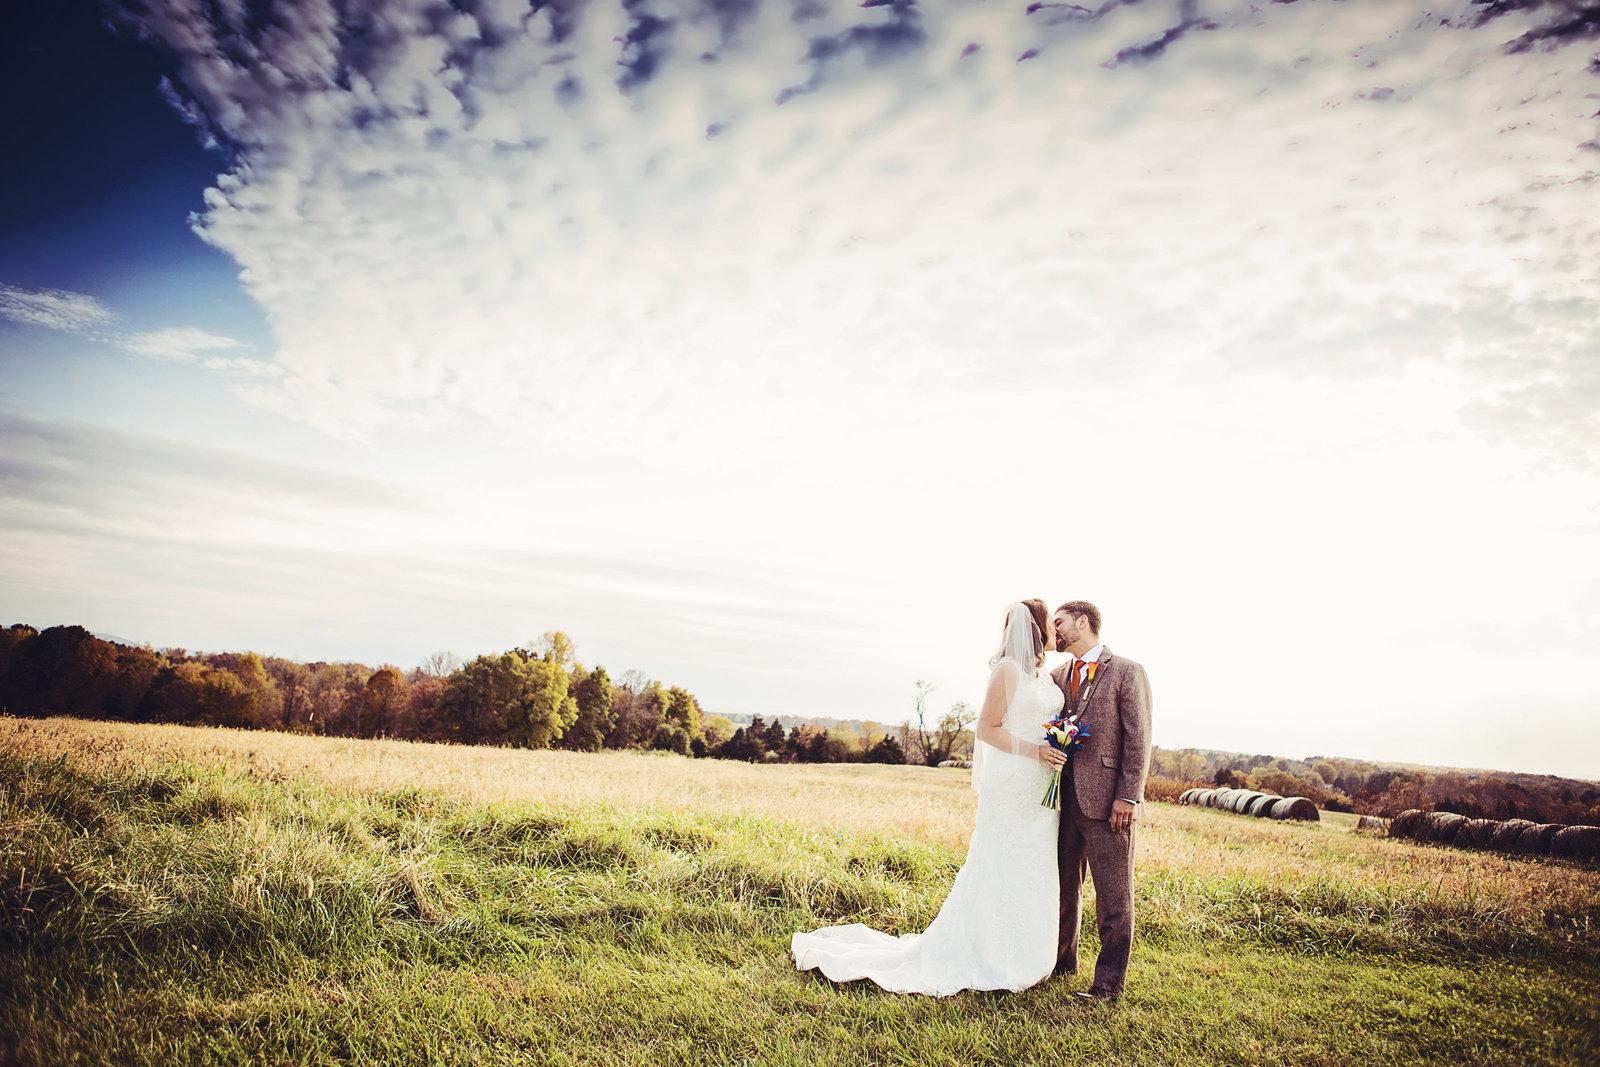 wedding portrait skyryder engagement wedding photography blacksburg roanoke charlottesville lexington radford-223